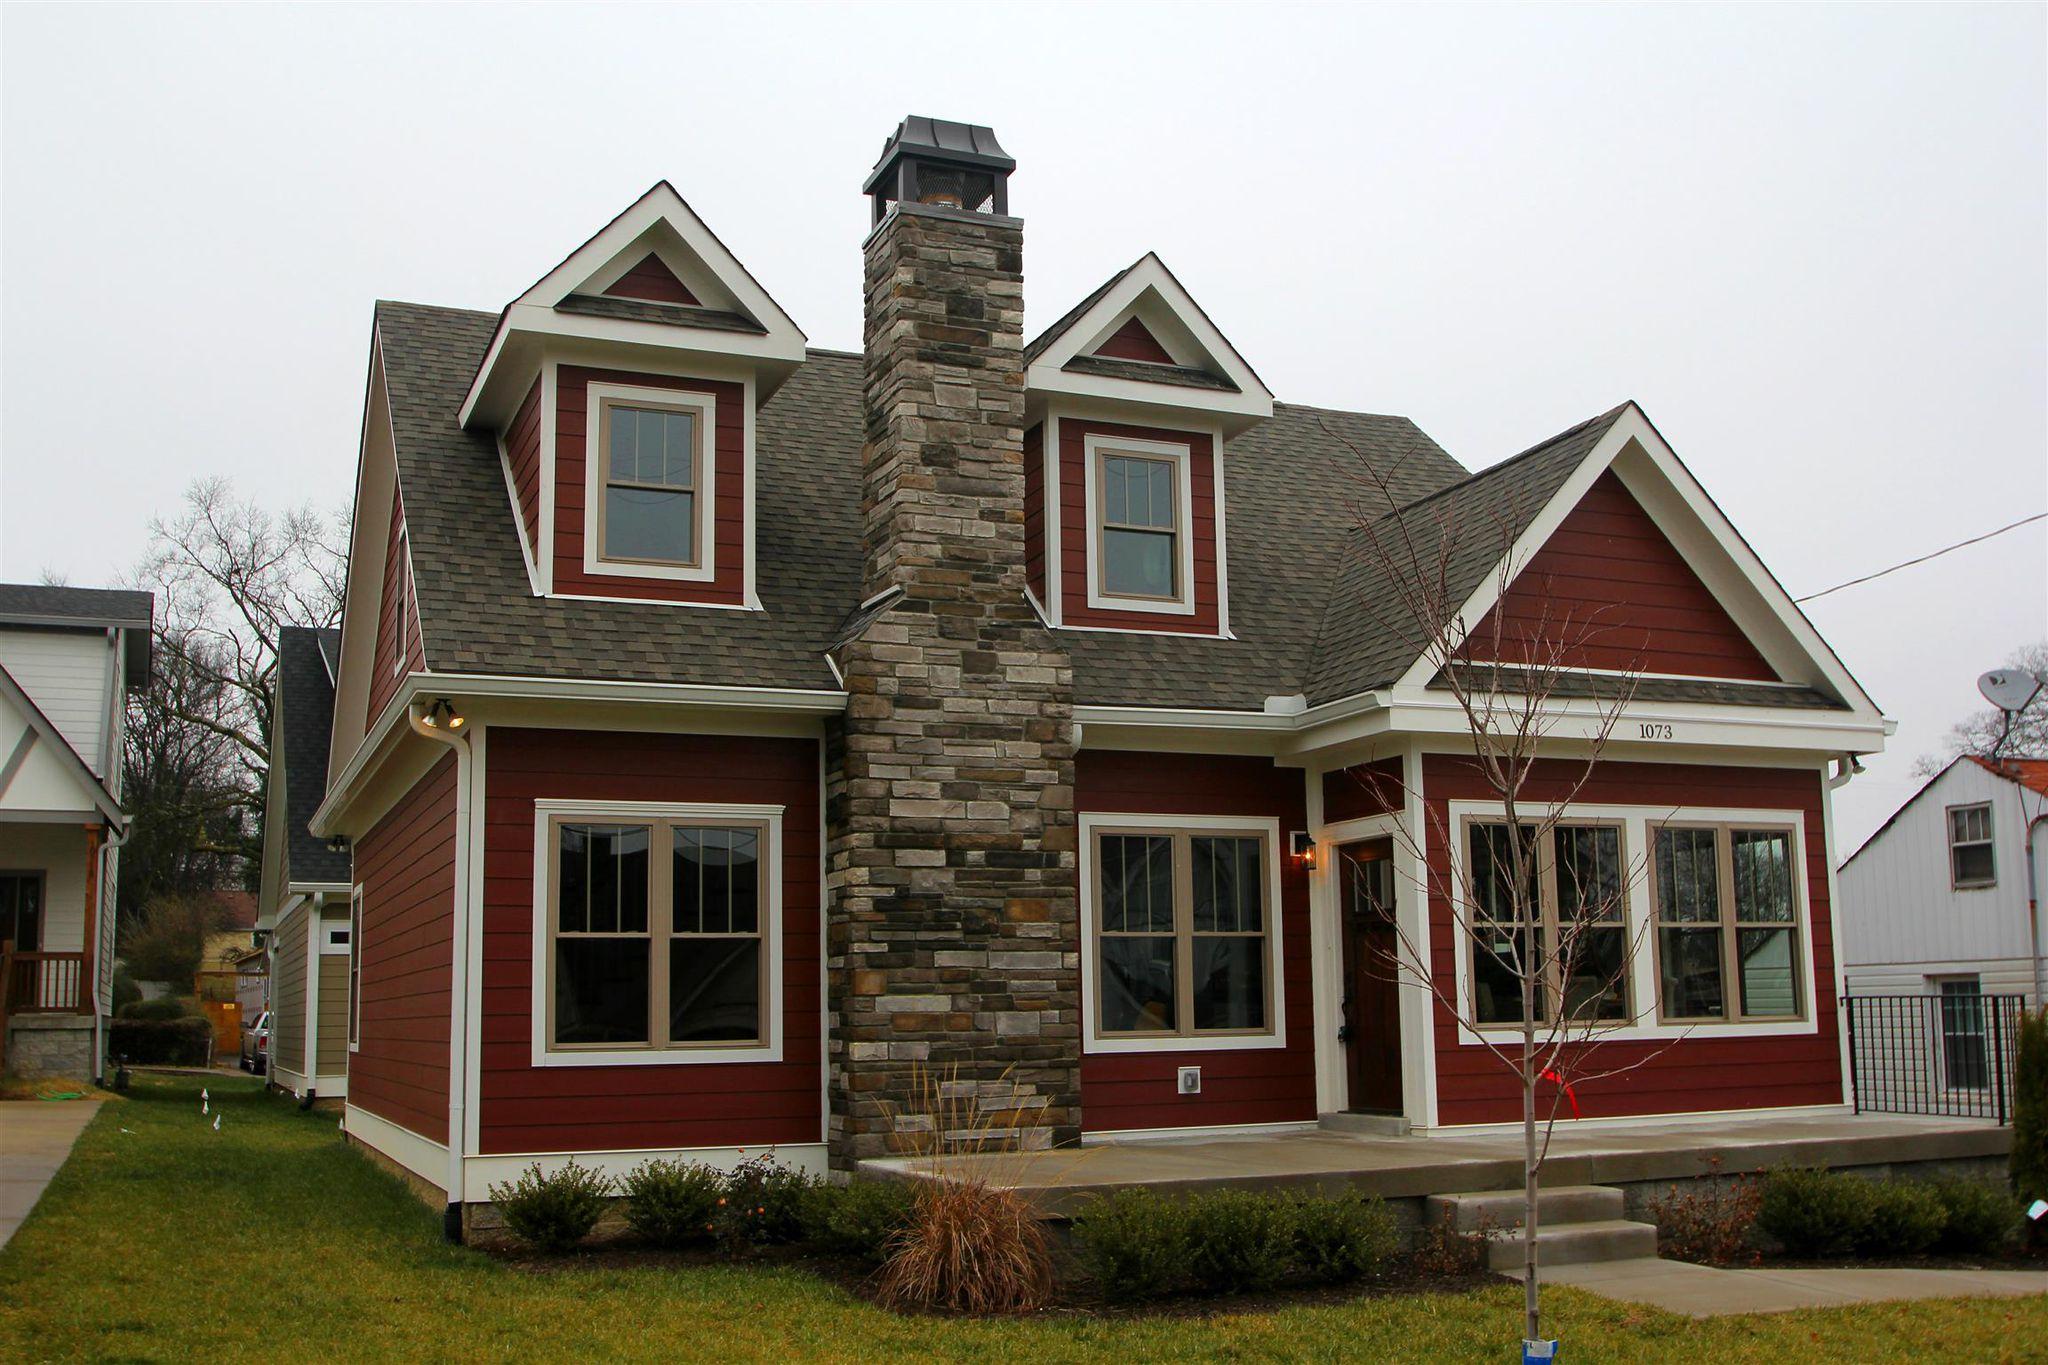 1073 Zophi St, Nashville, TN 37216 - Estimate and Home Details | Trulia